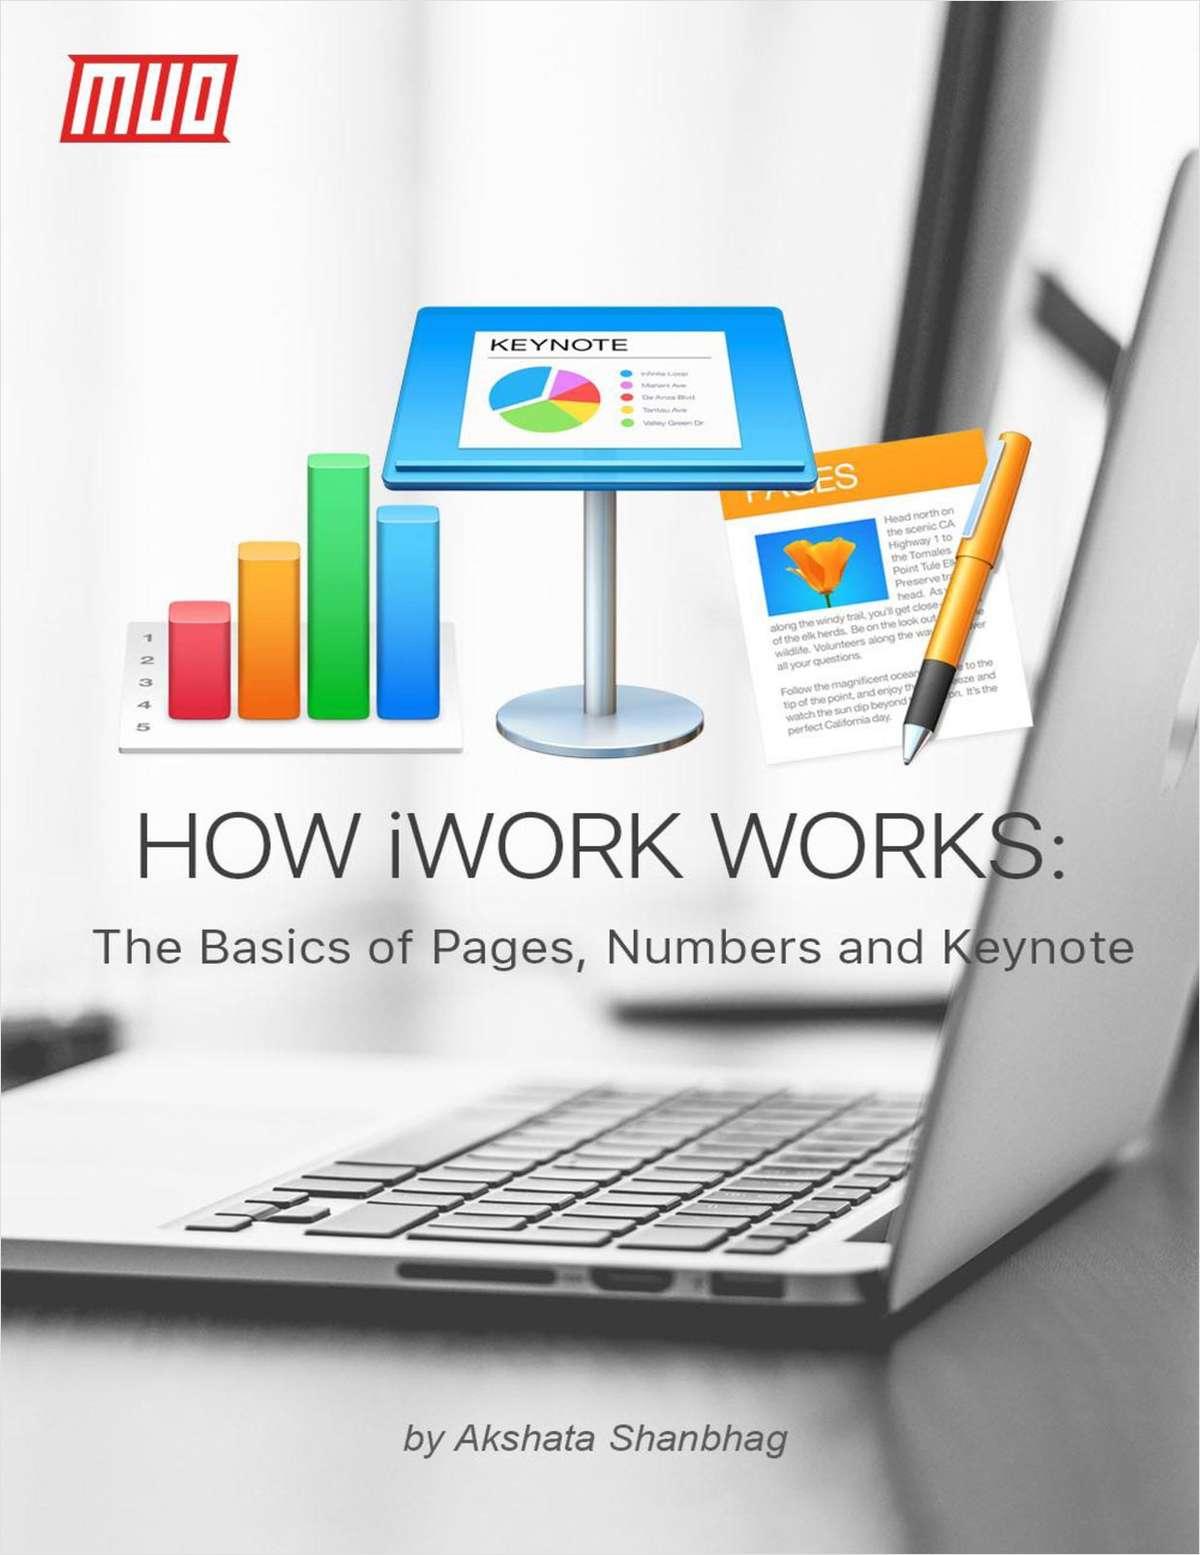 How iWork Works